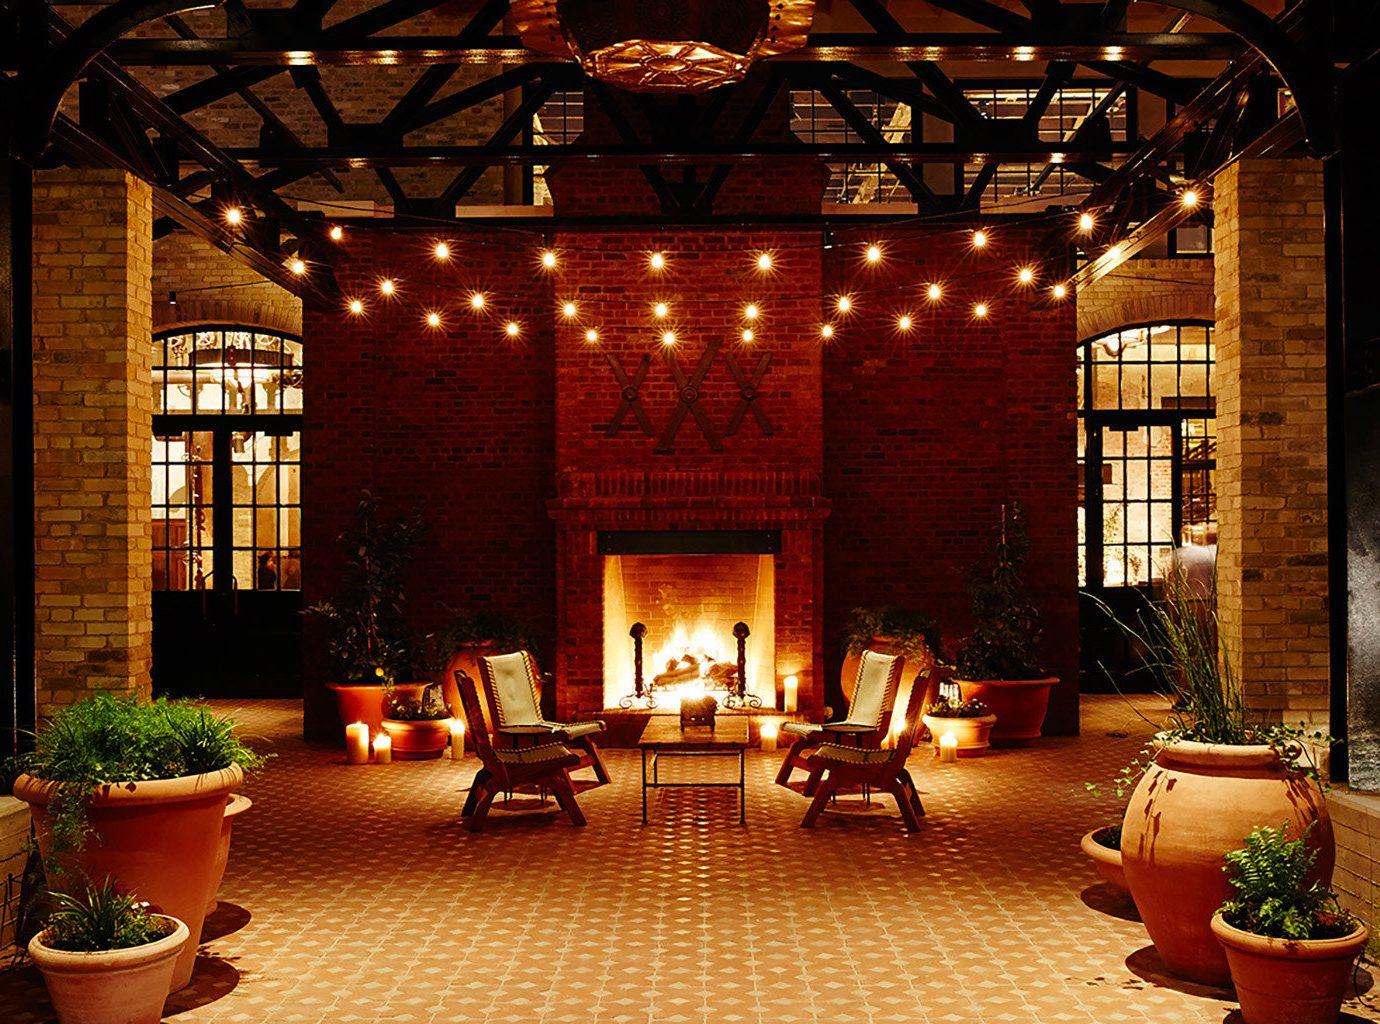 Lobby at Hotel Emma in San Antonio